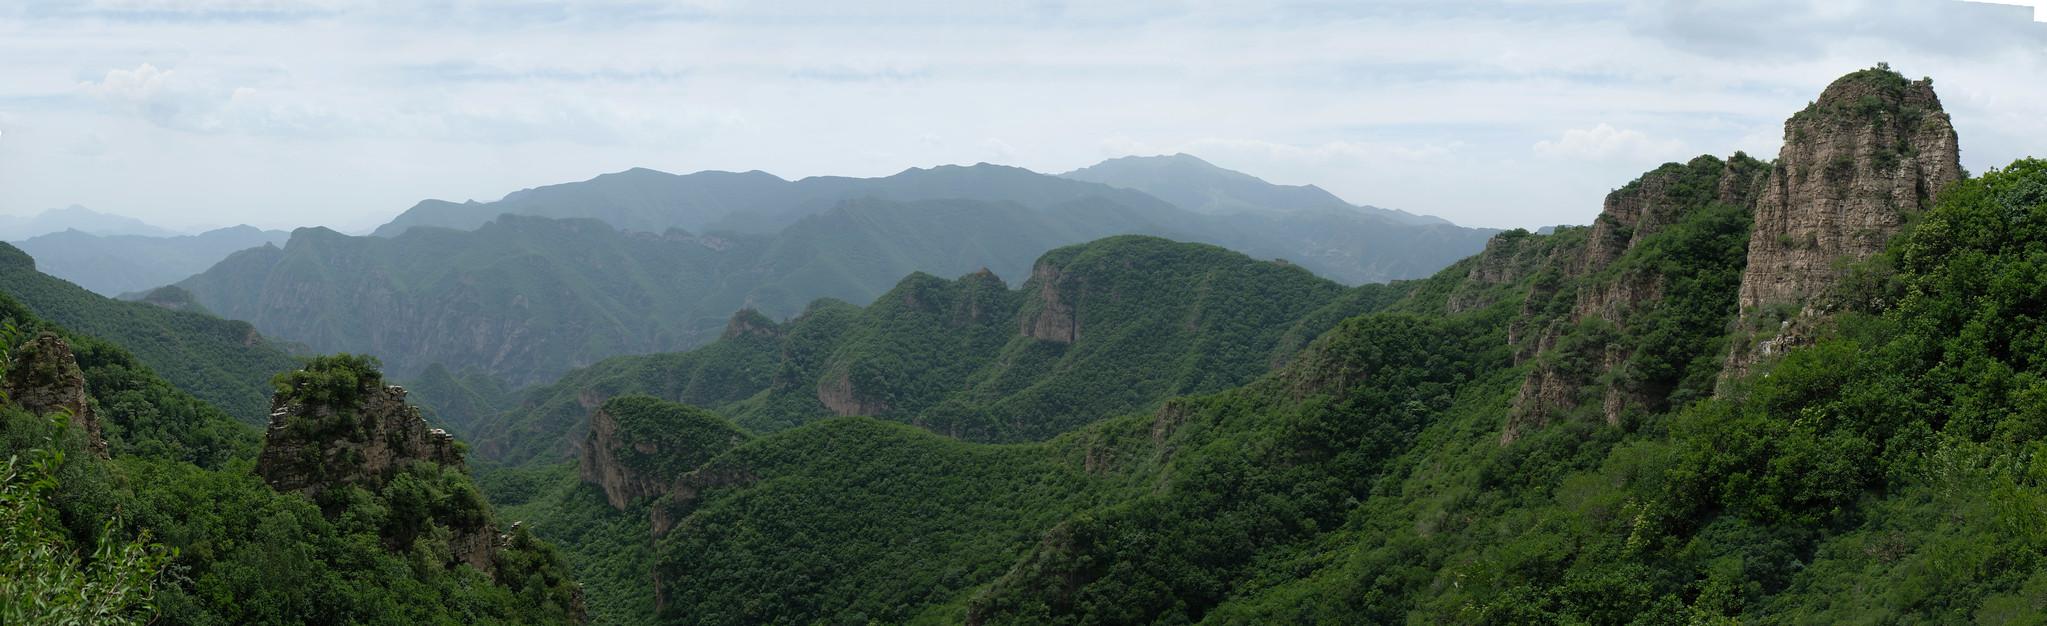 Panorama HuanCaoLiang